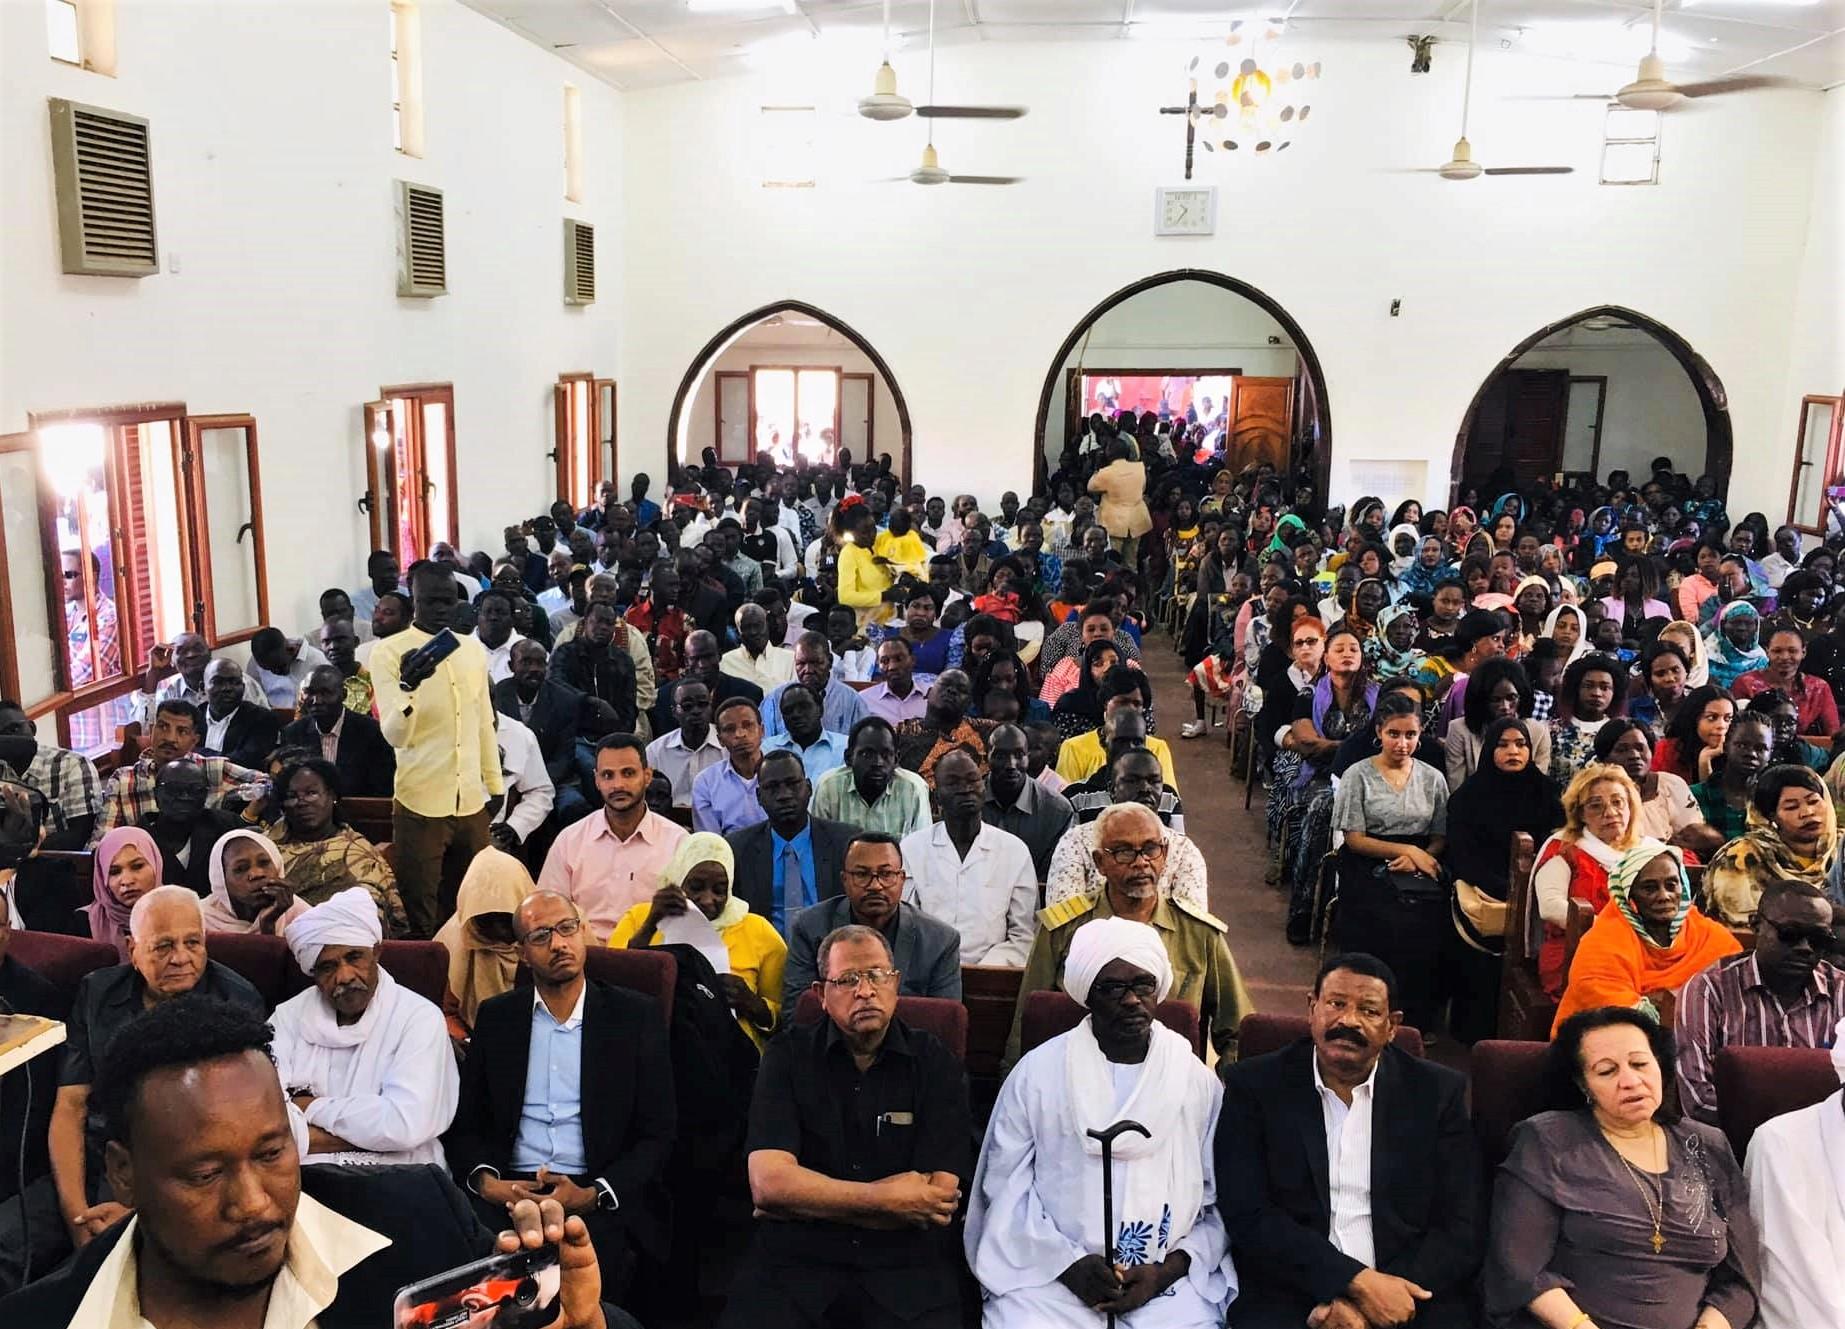 Muslim government officials attend Christmas service at Khartoum Bahri Evangelical Church on Dec. 25, 2019. (Courtesy of Bahri church)